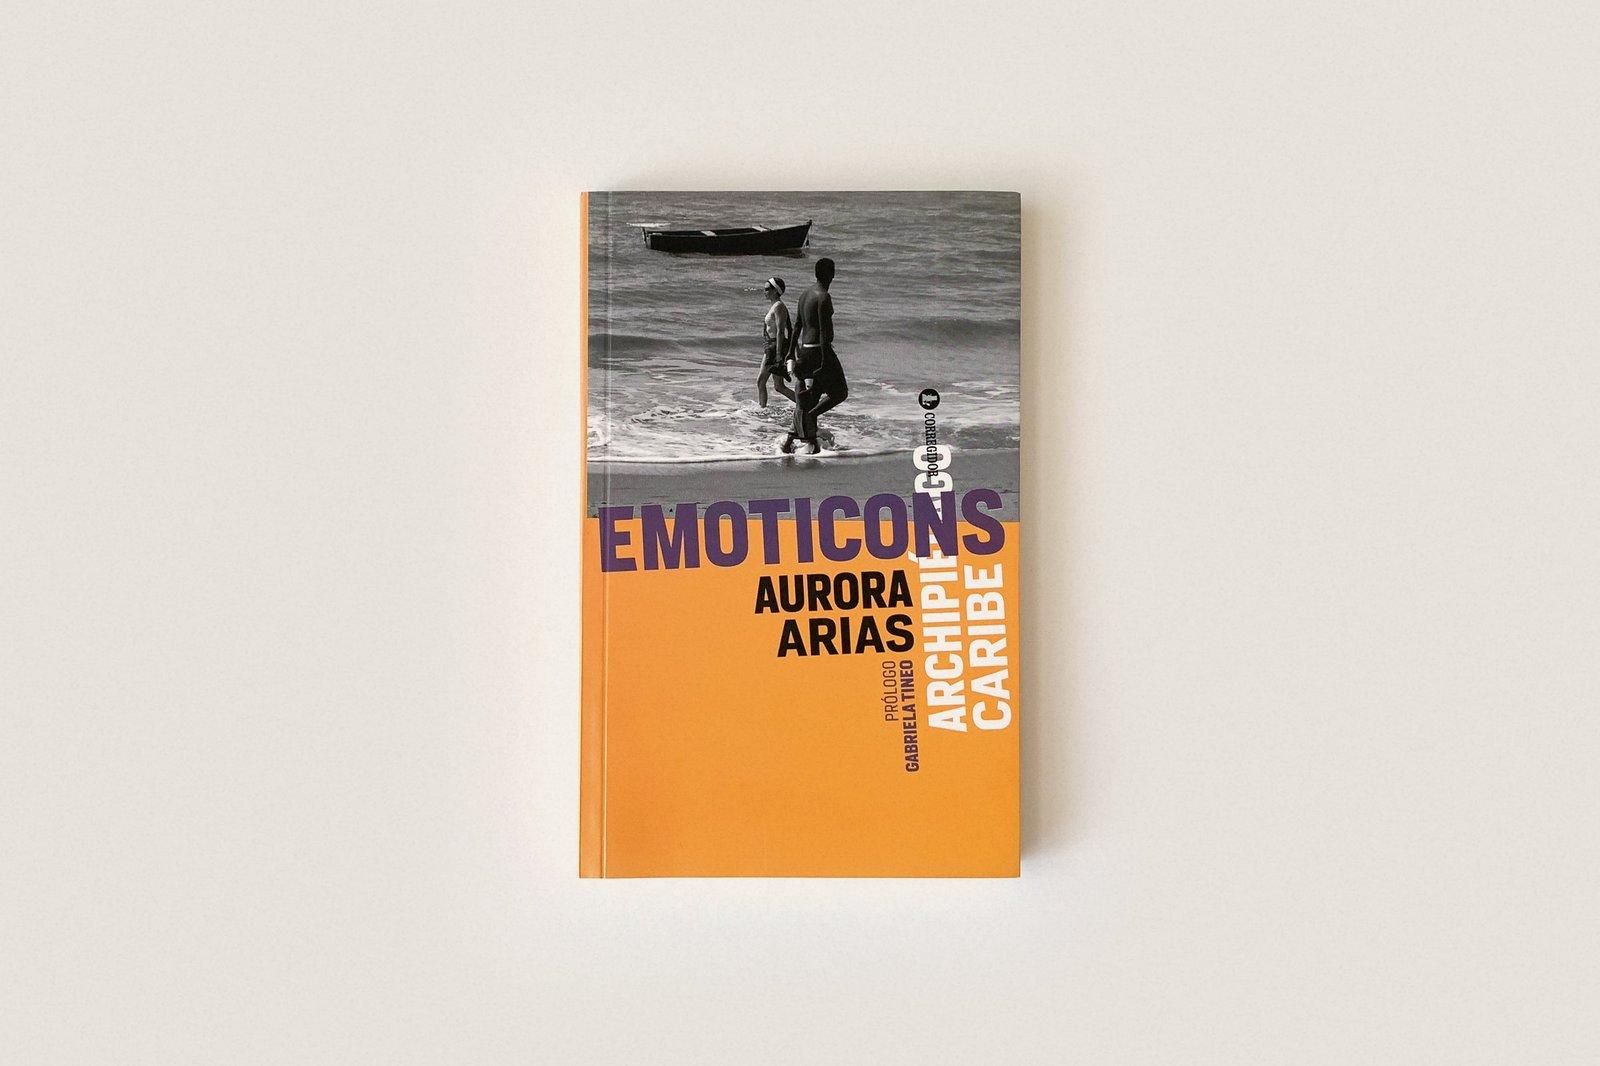 Libro: Emoticons — Aurora Arias